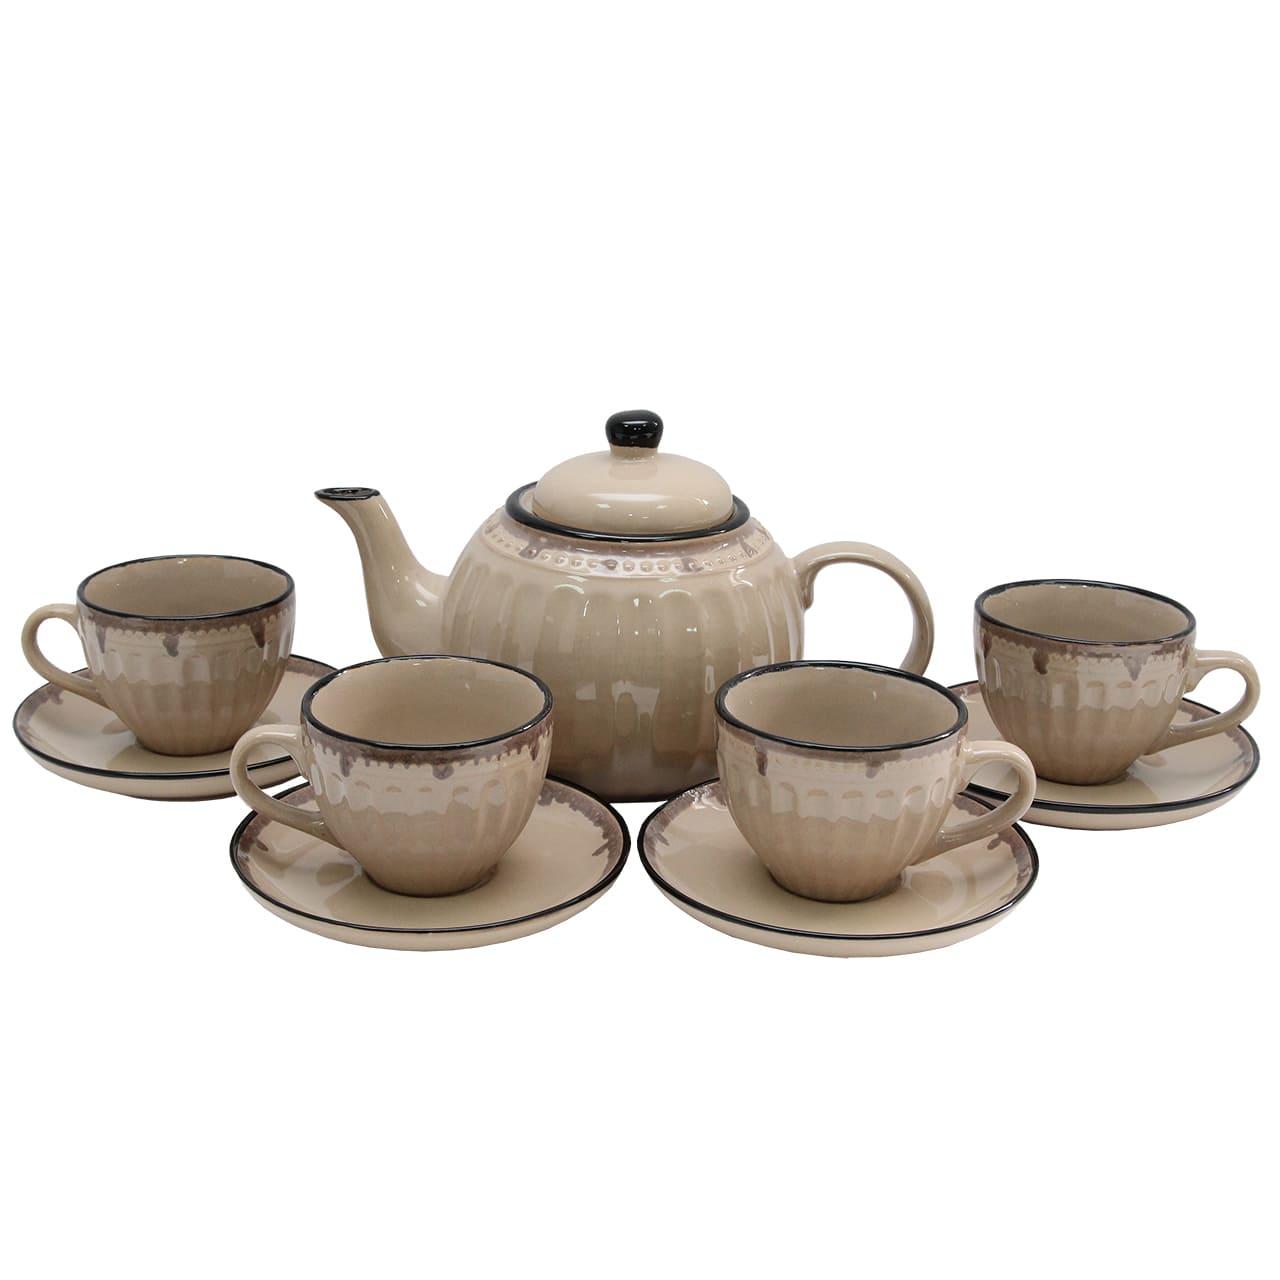 Set Cu Ceainic Si 4 Pahare Din Ceramica Maro